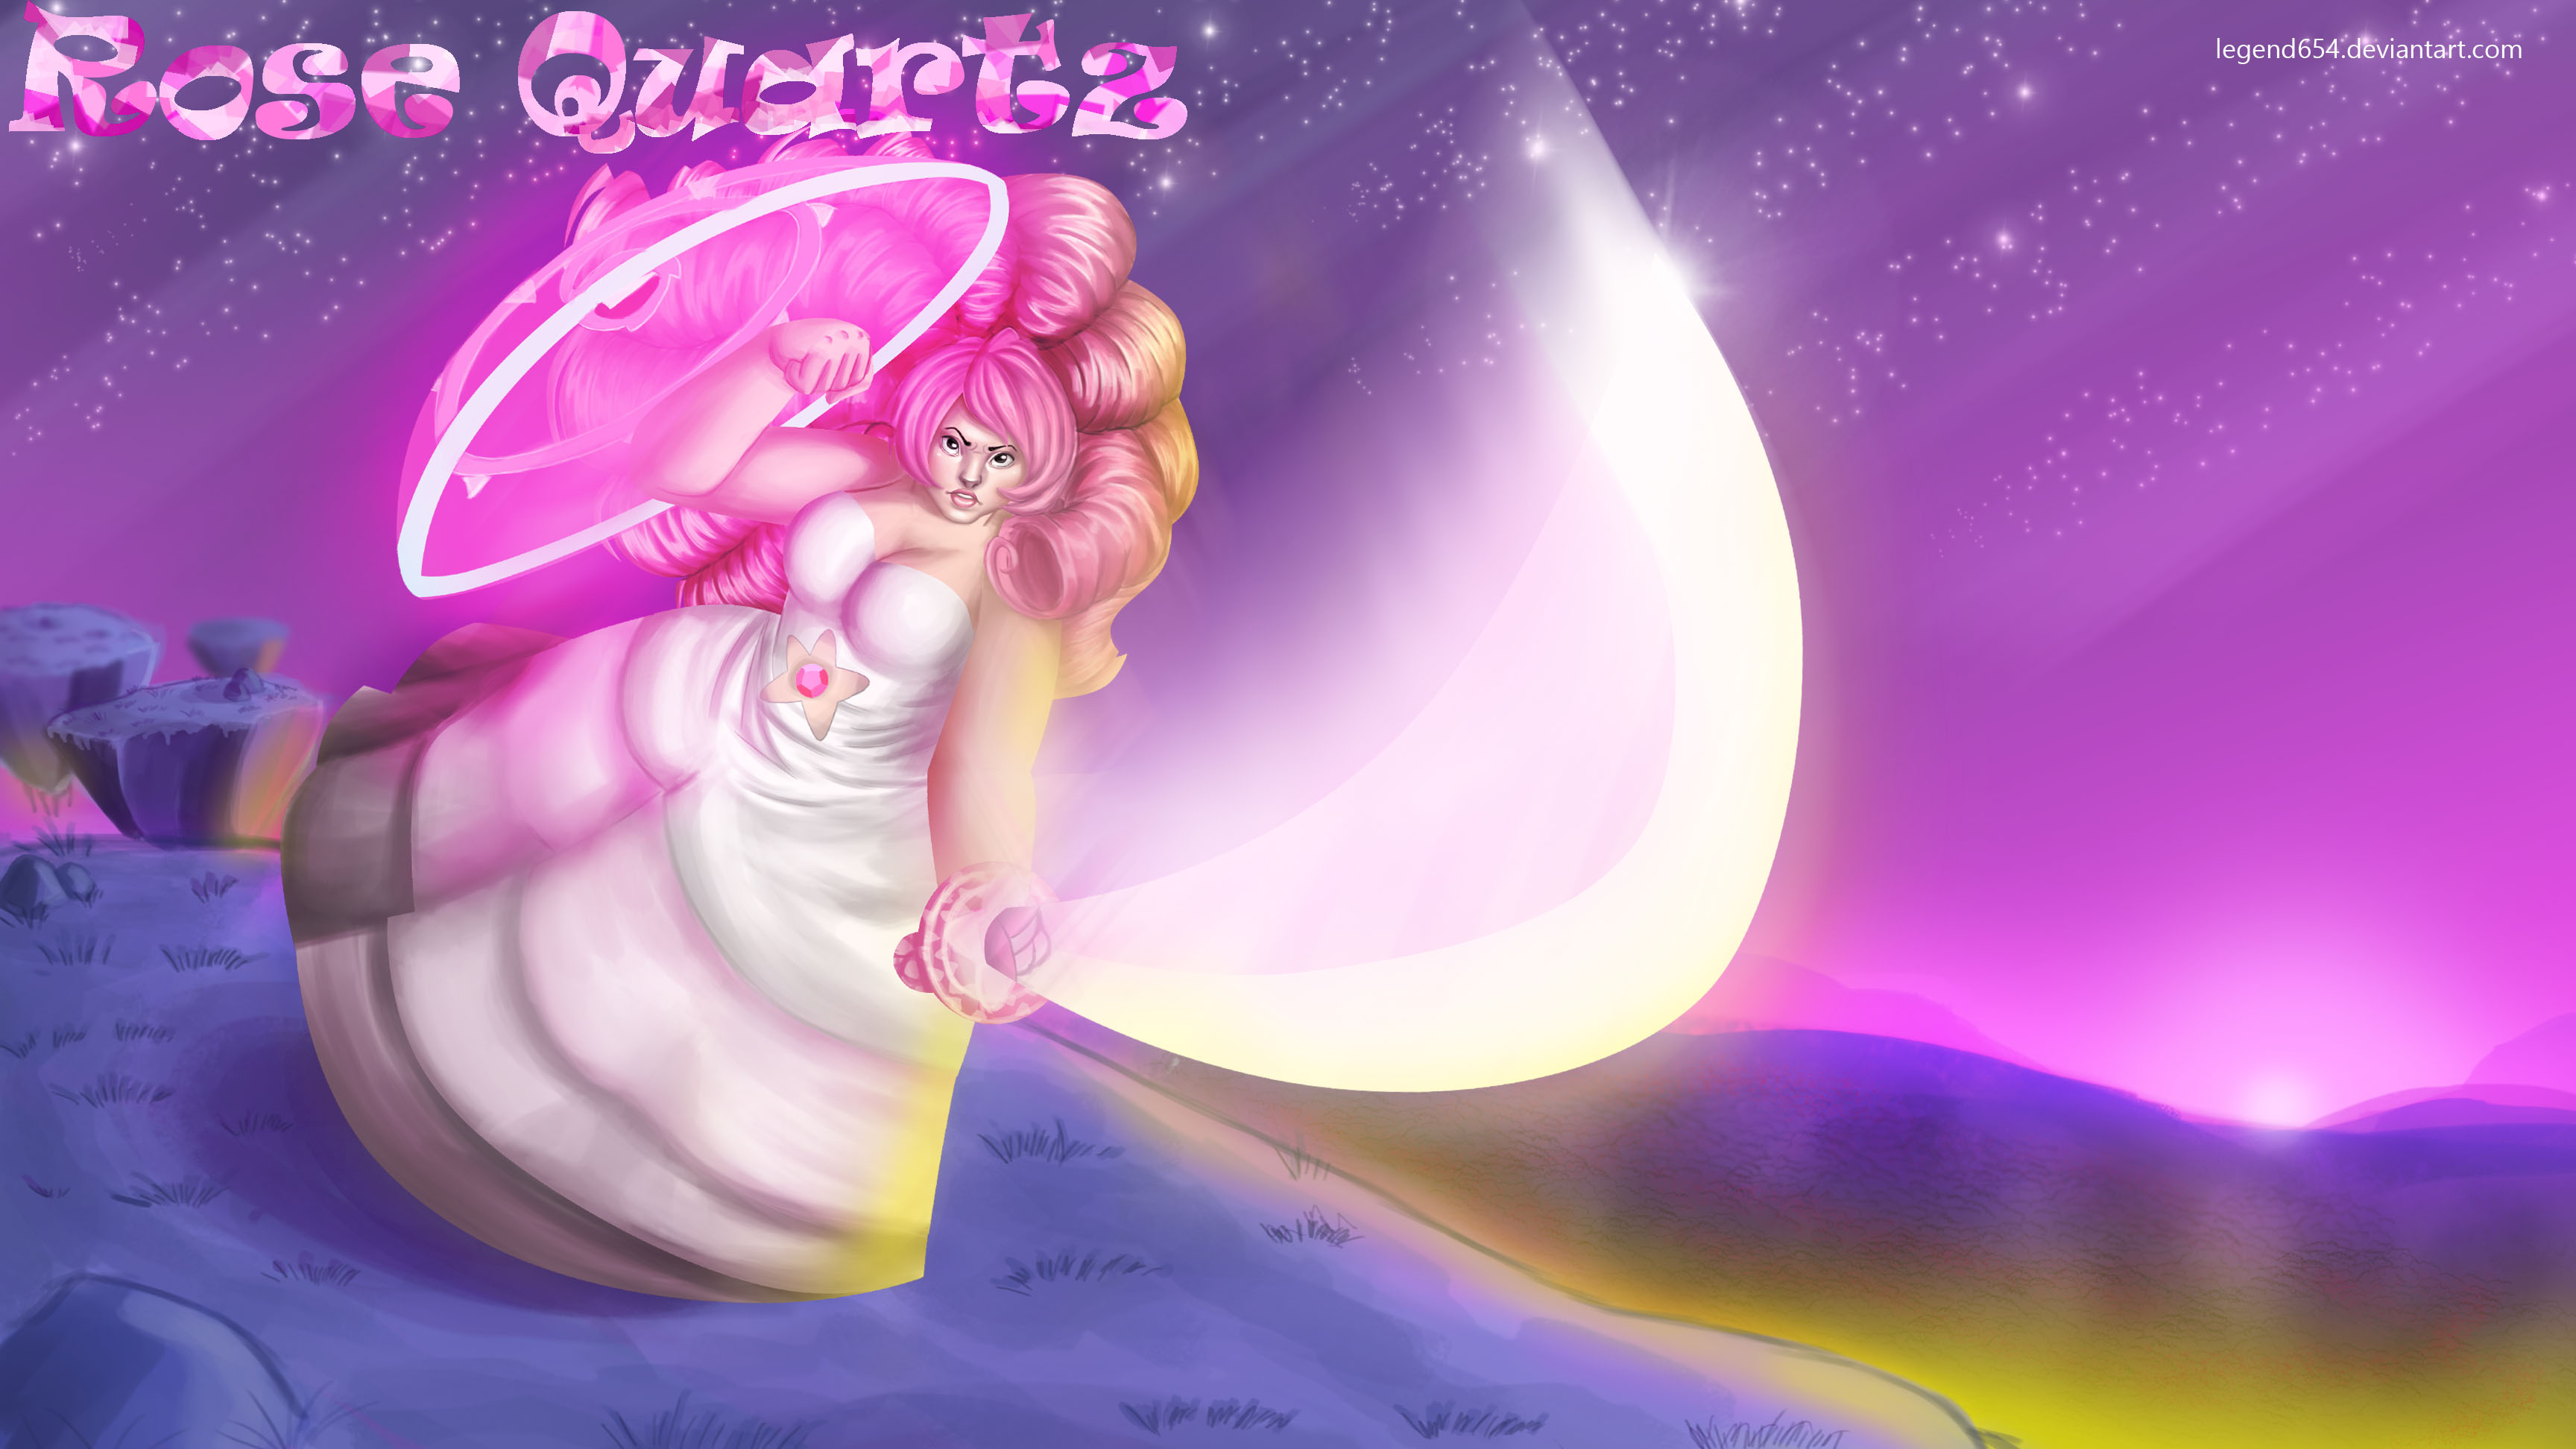 24 Rose Quartz Steven Universe Wallpapers On Wallpapersafari